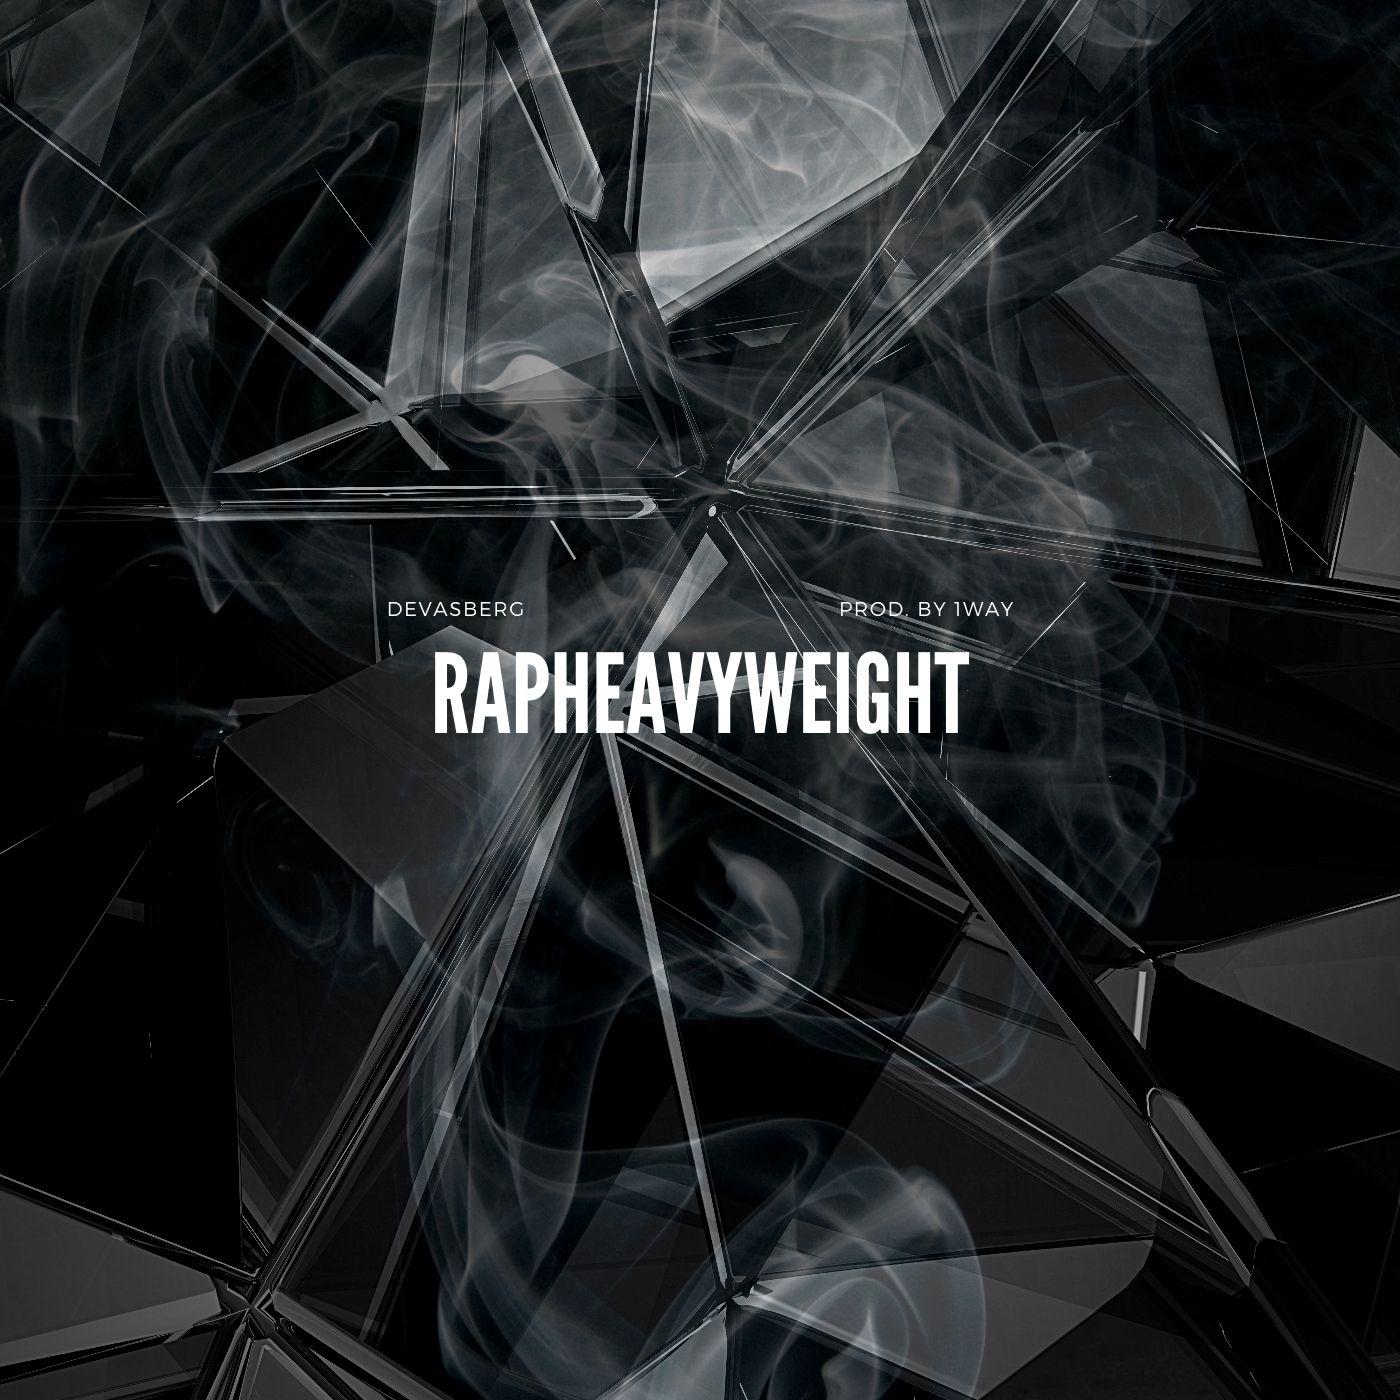 Upcoming: Devasberg - Rapheavyweight